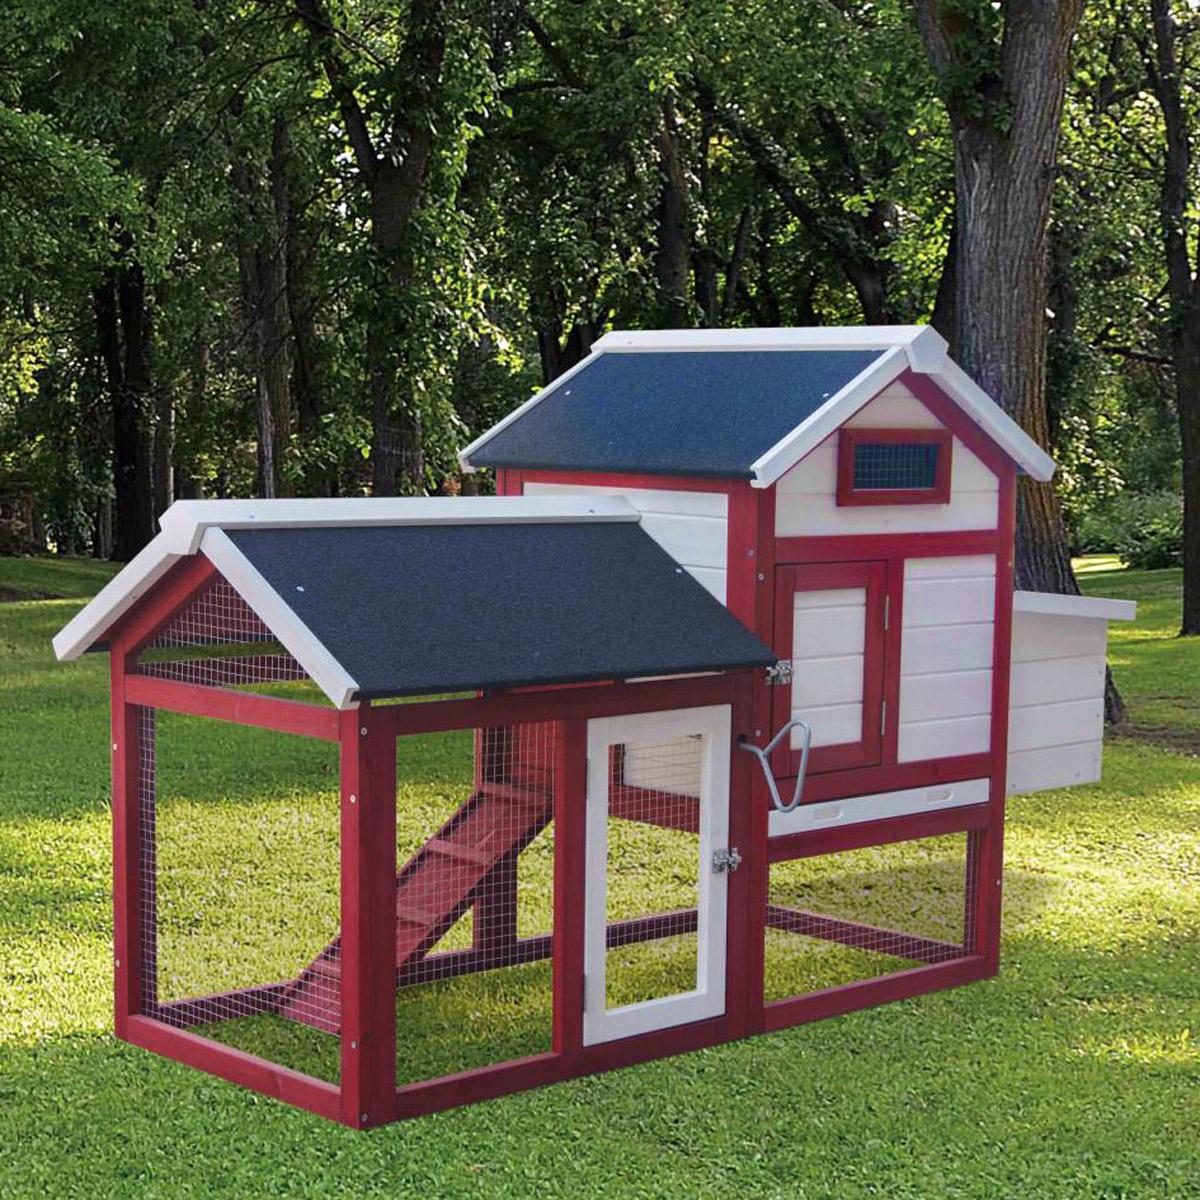 h hnerstall gefl gelstall hasenstall kaninchenstall kaninchenk fig h hnerhaus ebay. Black Bedroom Furniture Sets. Home Design Ideas